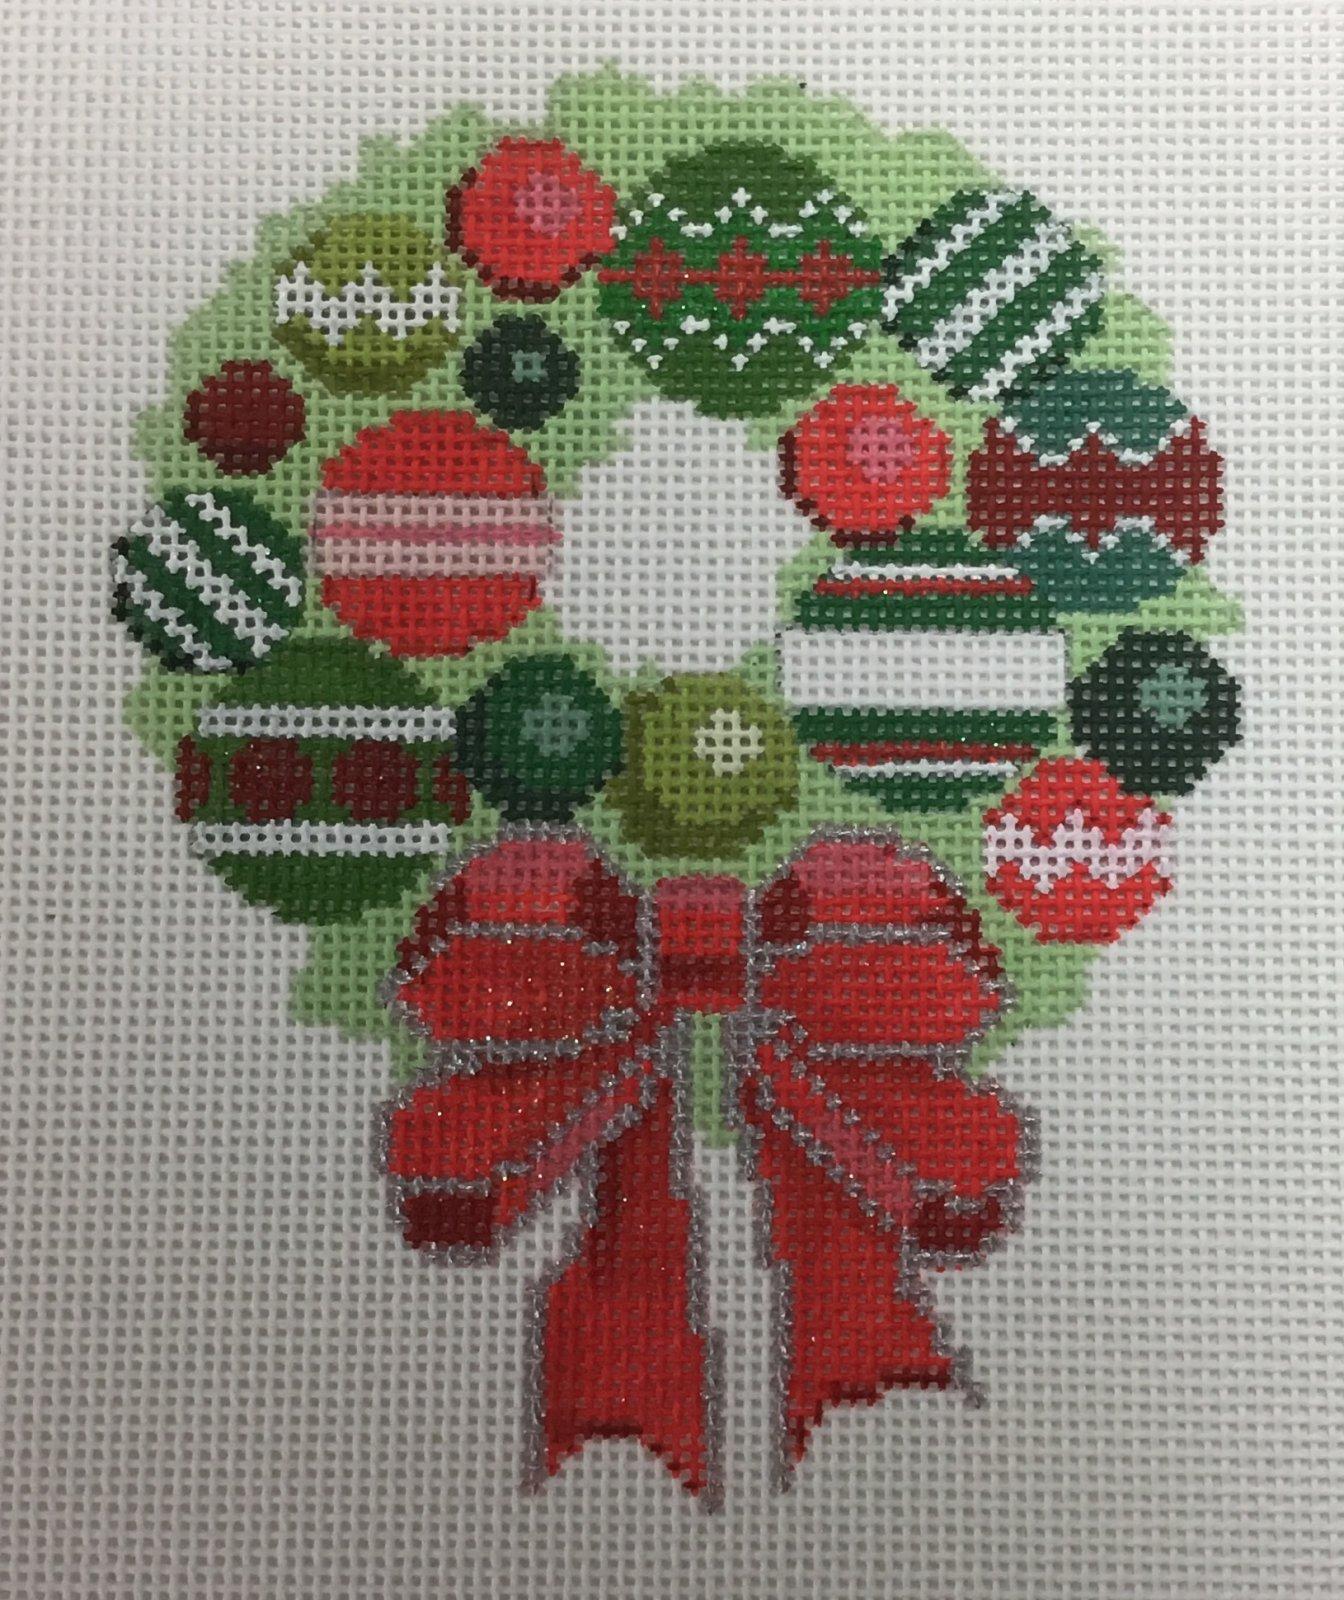 Bauble Wreath,18 ct.,4x5